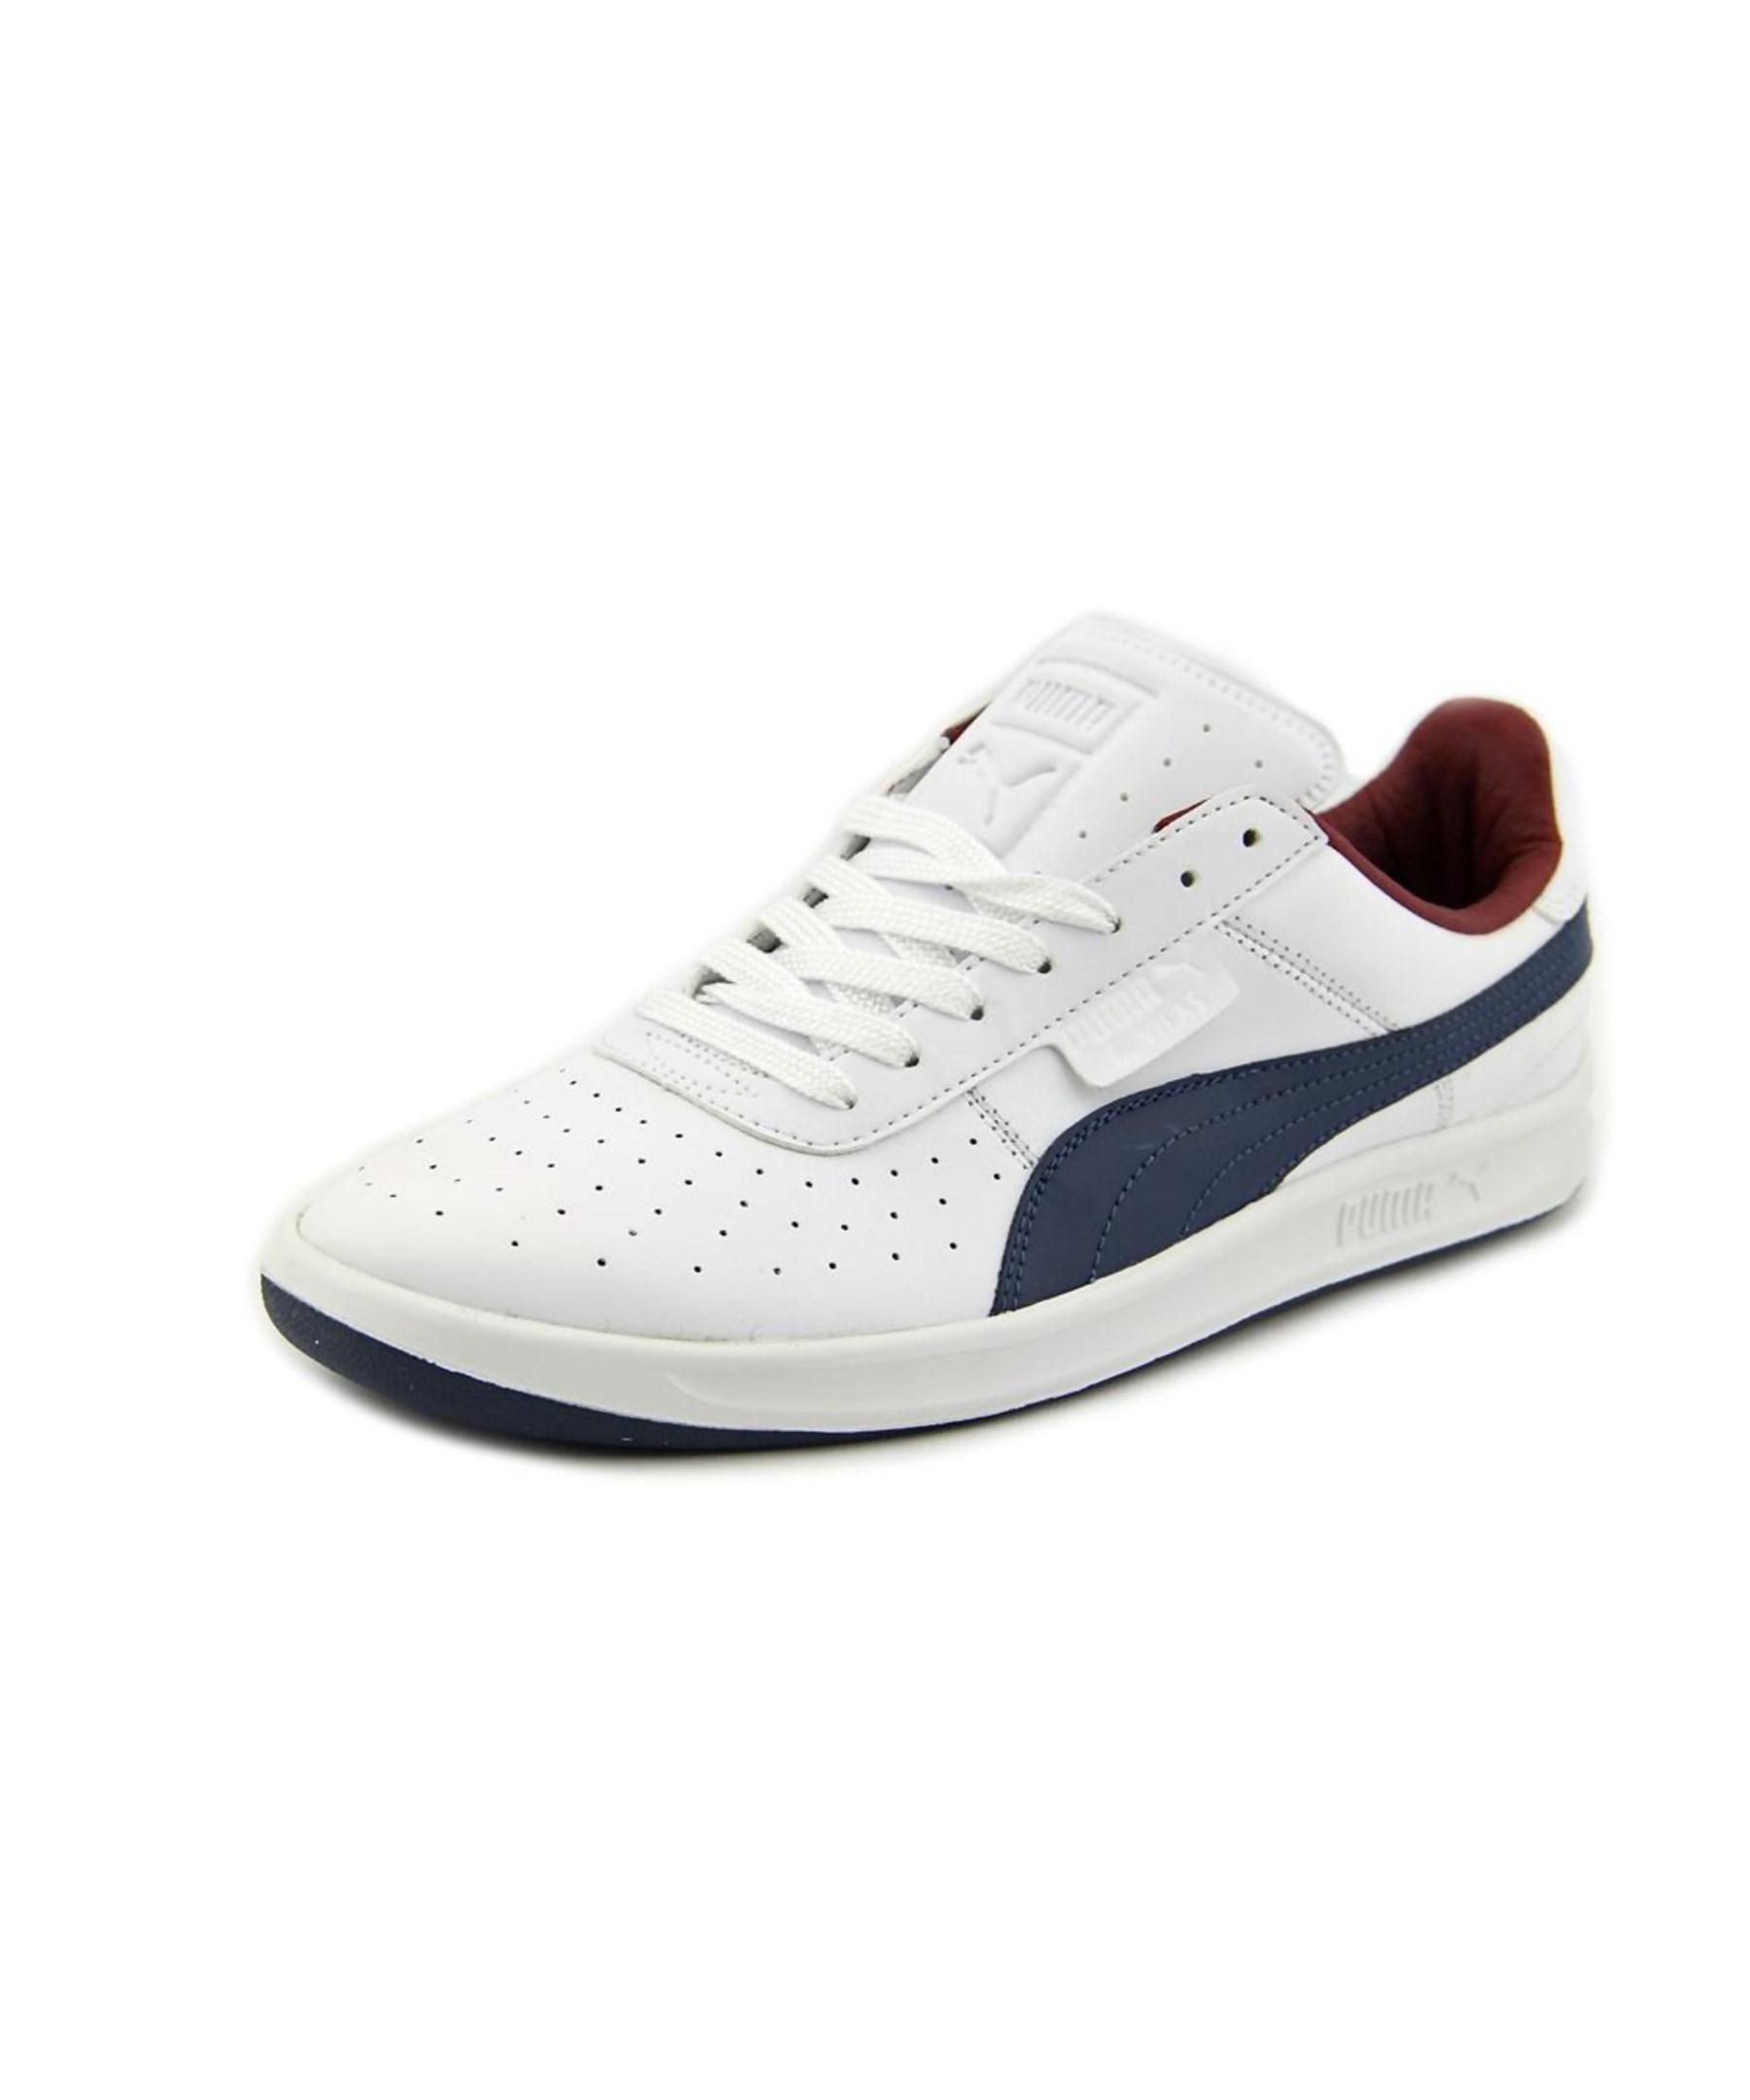 06c4804c3c51 Lyst - Puma G. Vilas L2 Men Round Toe Leather White Sneakers in ...